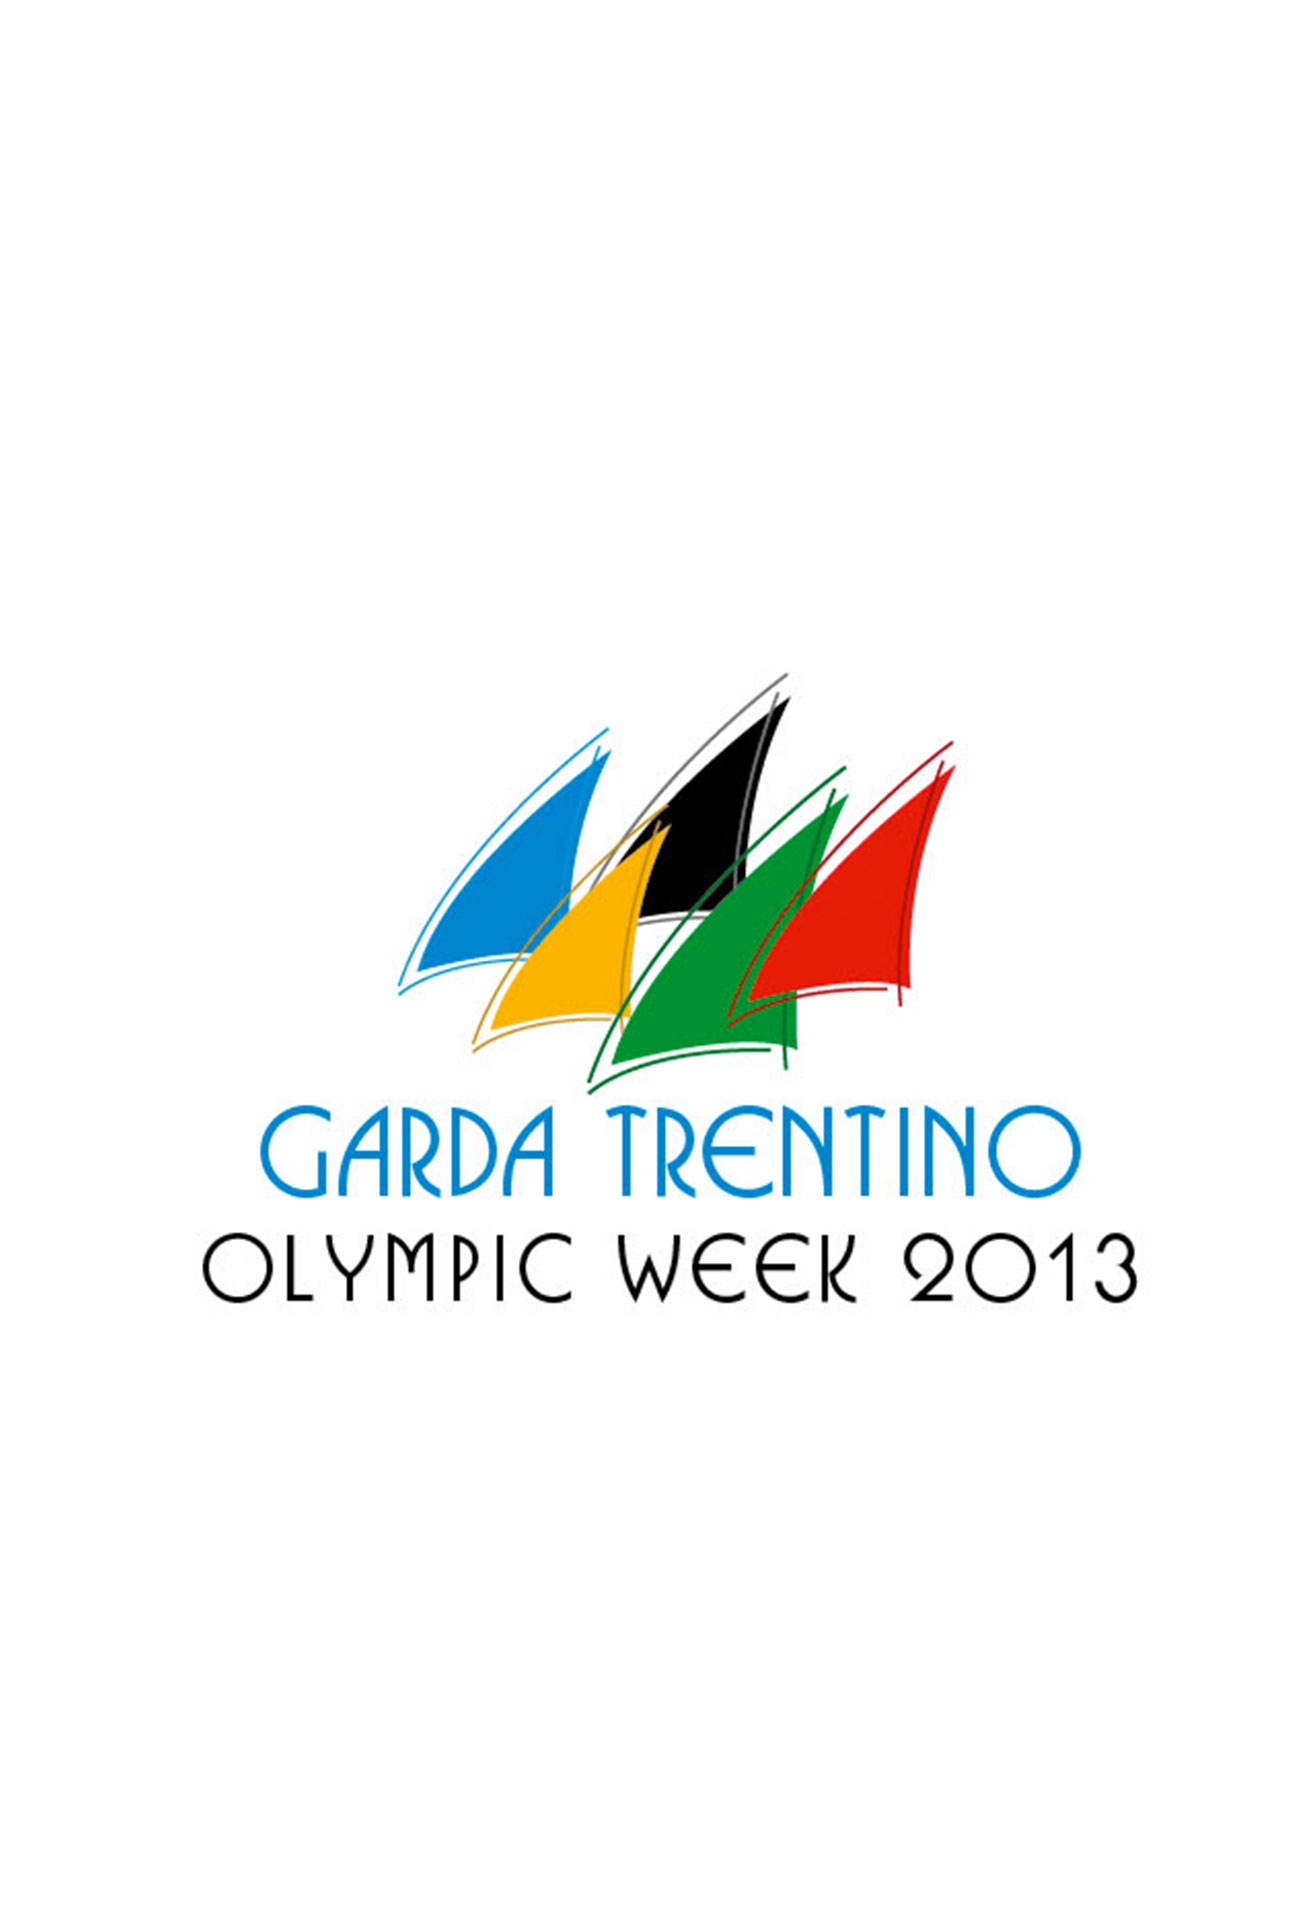 gardatrentinoolympicweek-fragliavelariva-egiolai_p